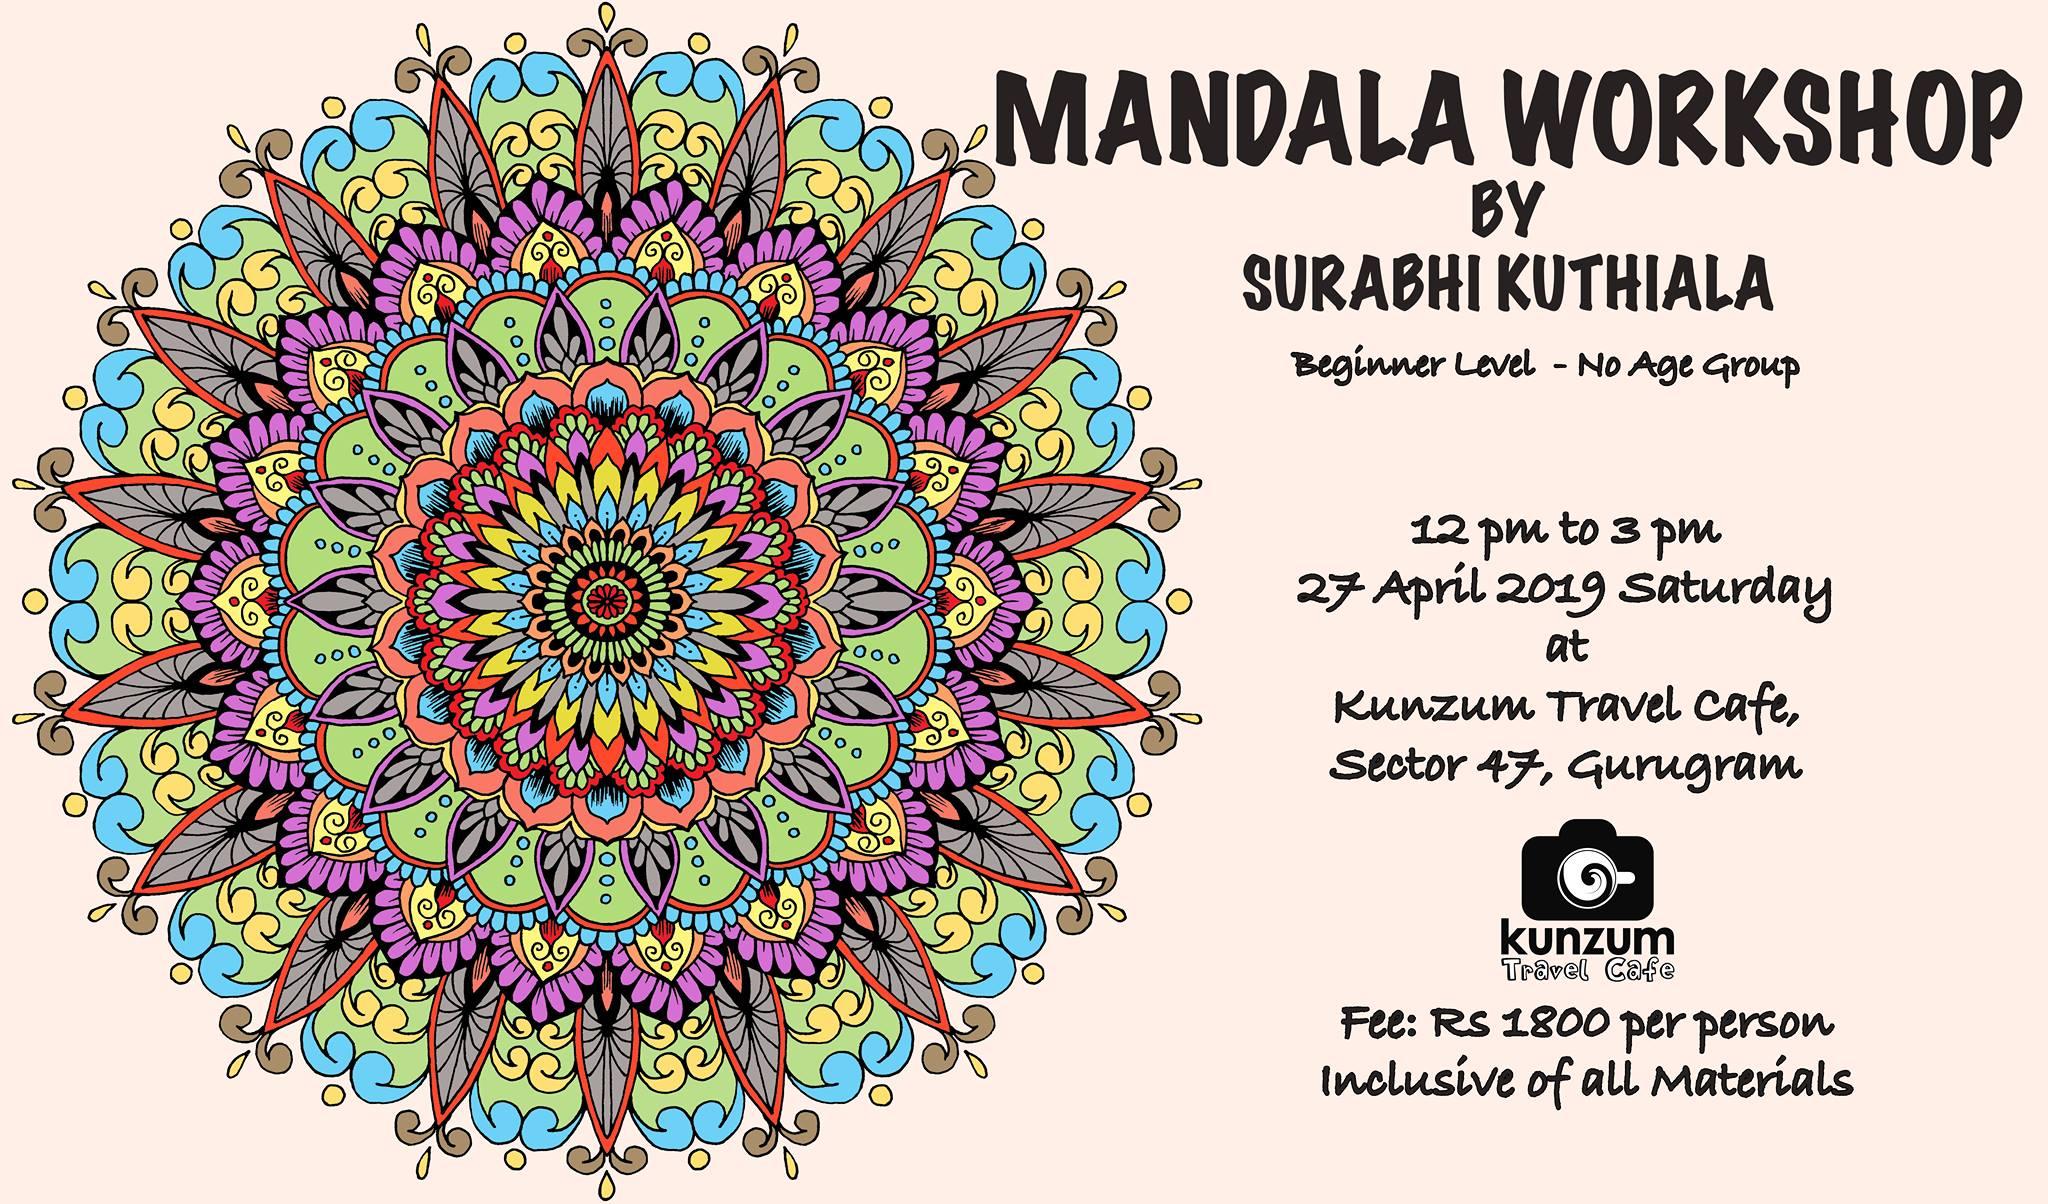 Mandala Workshop | April 27, 2019 - Kunzum - We Travel. What dedans Mandala Fée